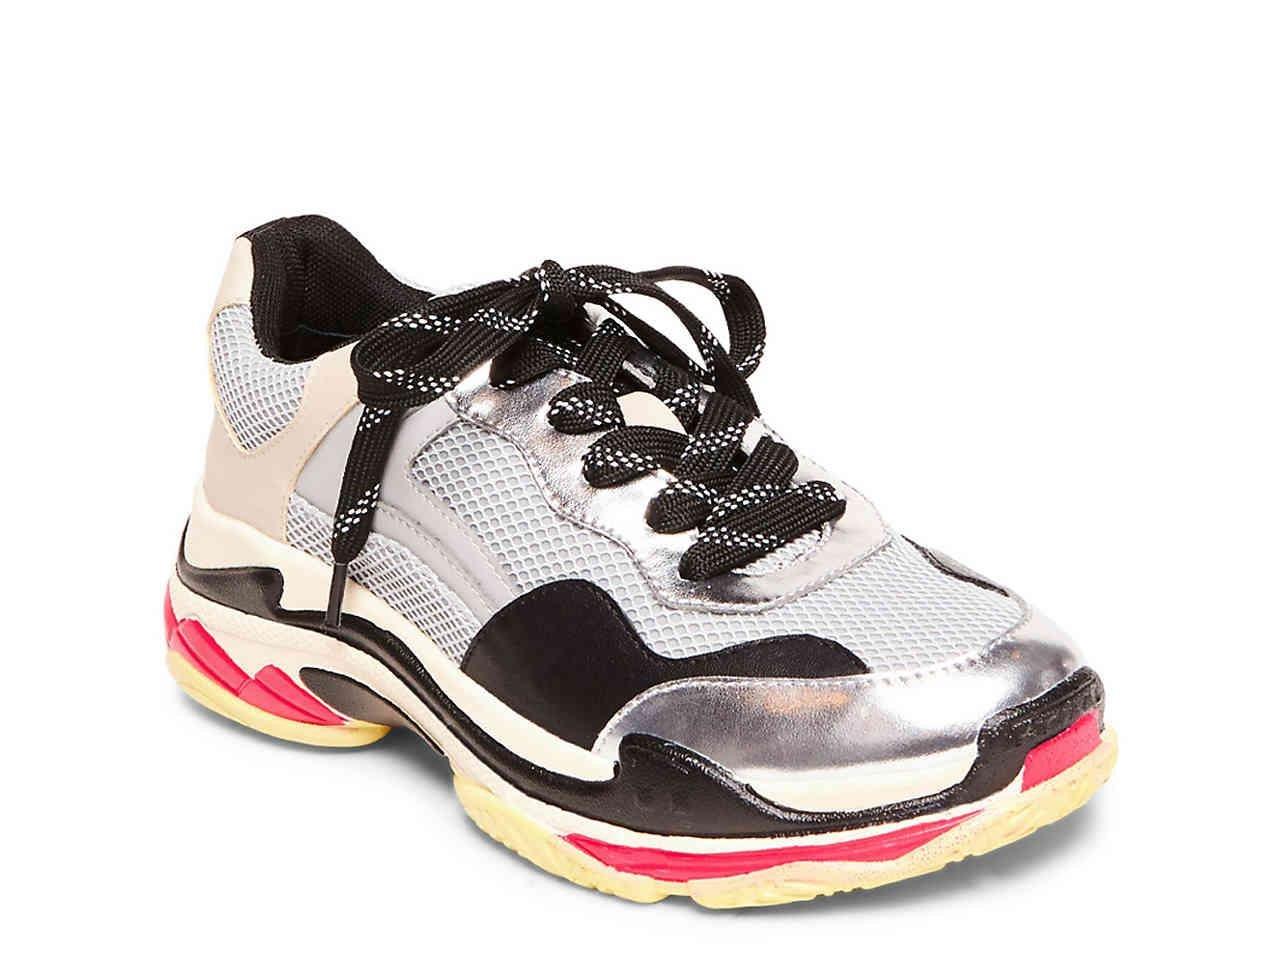 e81adfc2d1b Lyst - Steve Madden Nassau Sneaker in Metallic